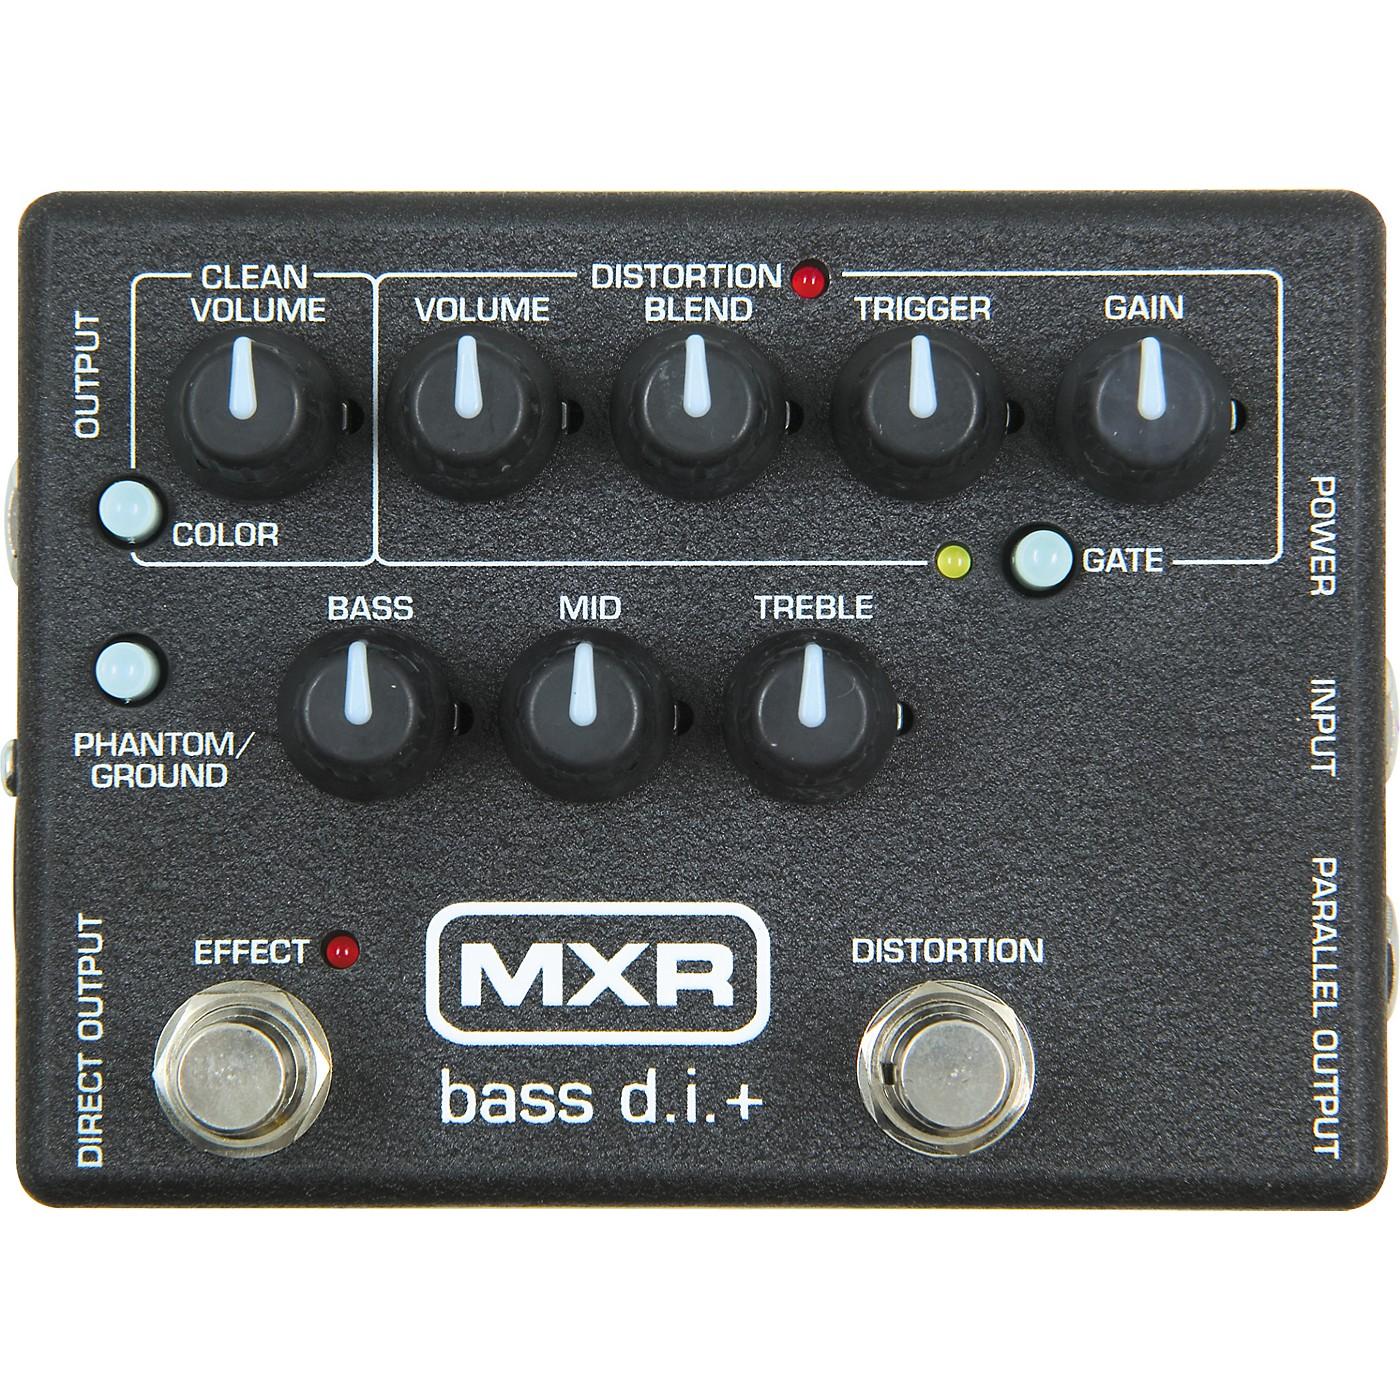 MXR M-80 Bass Direct Box with Distortion thumbnail